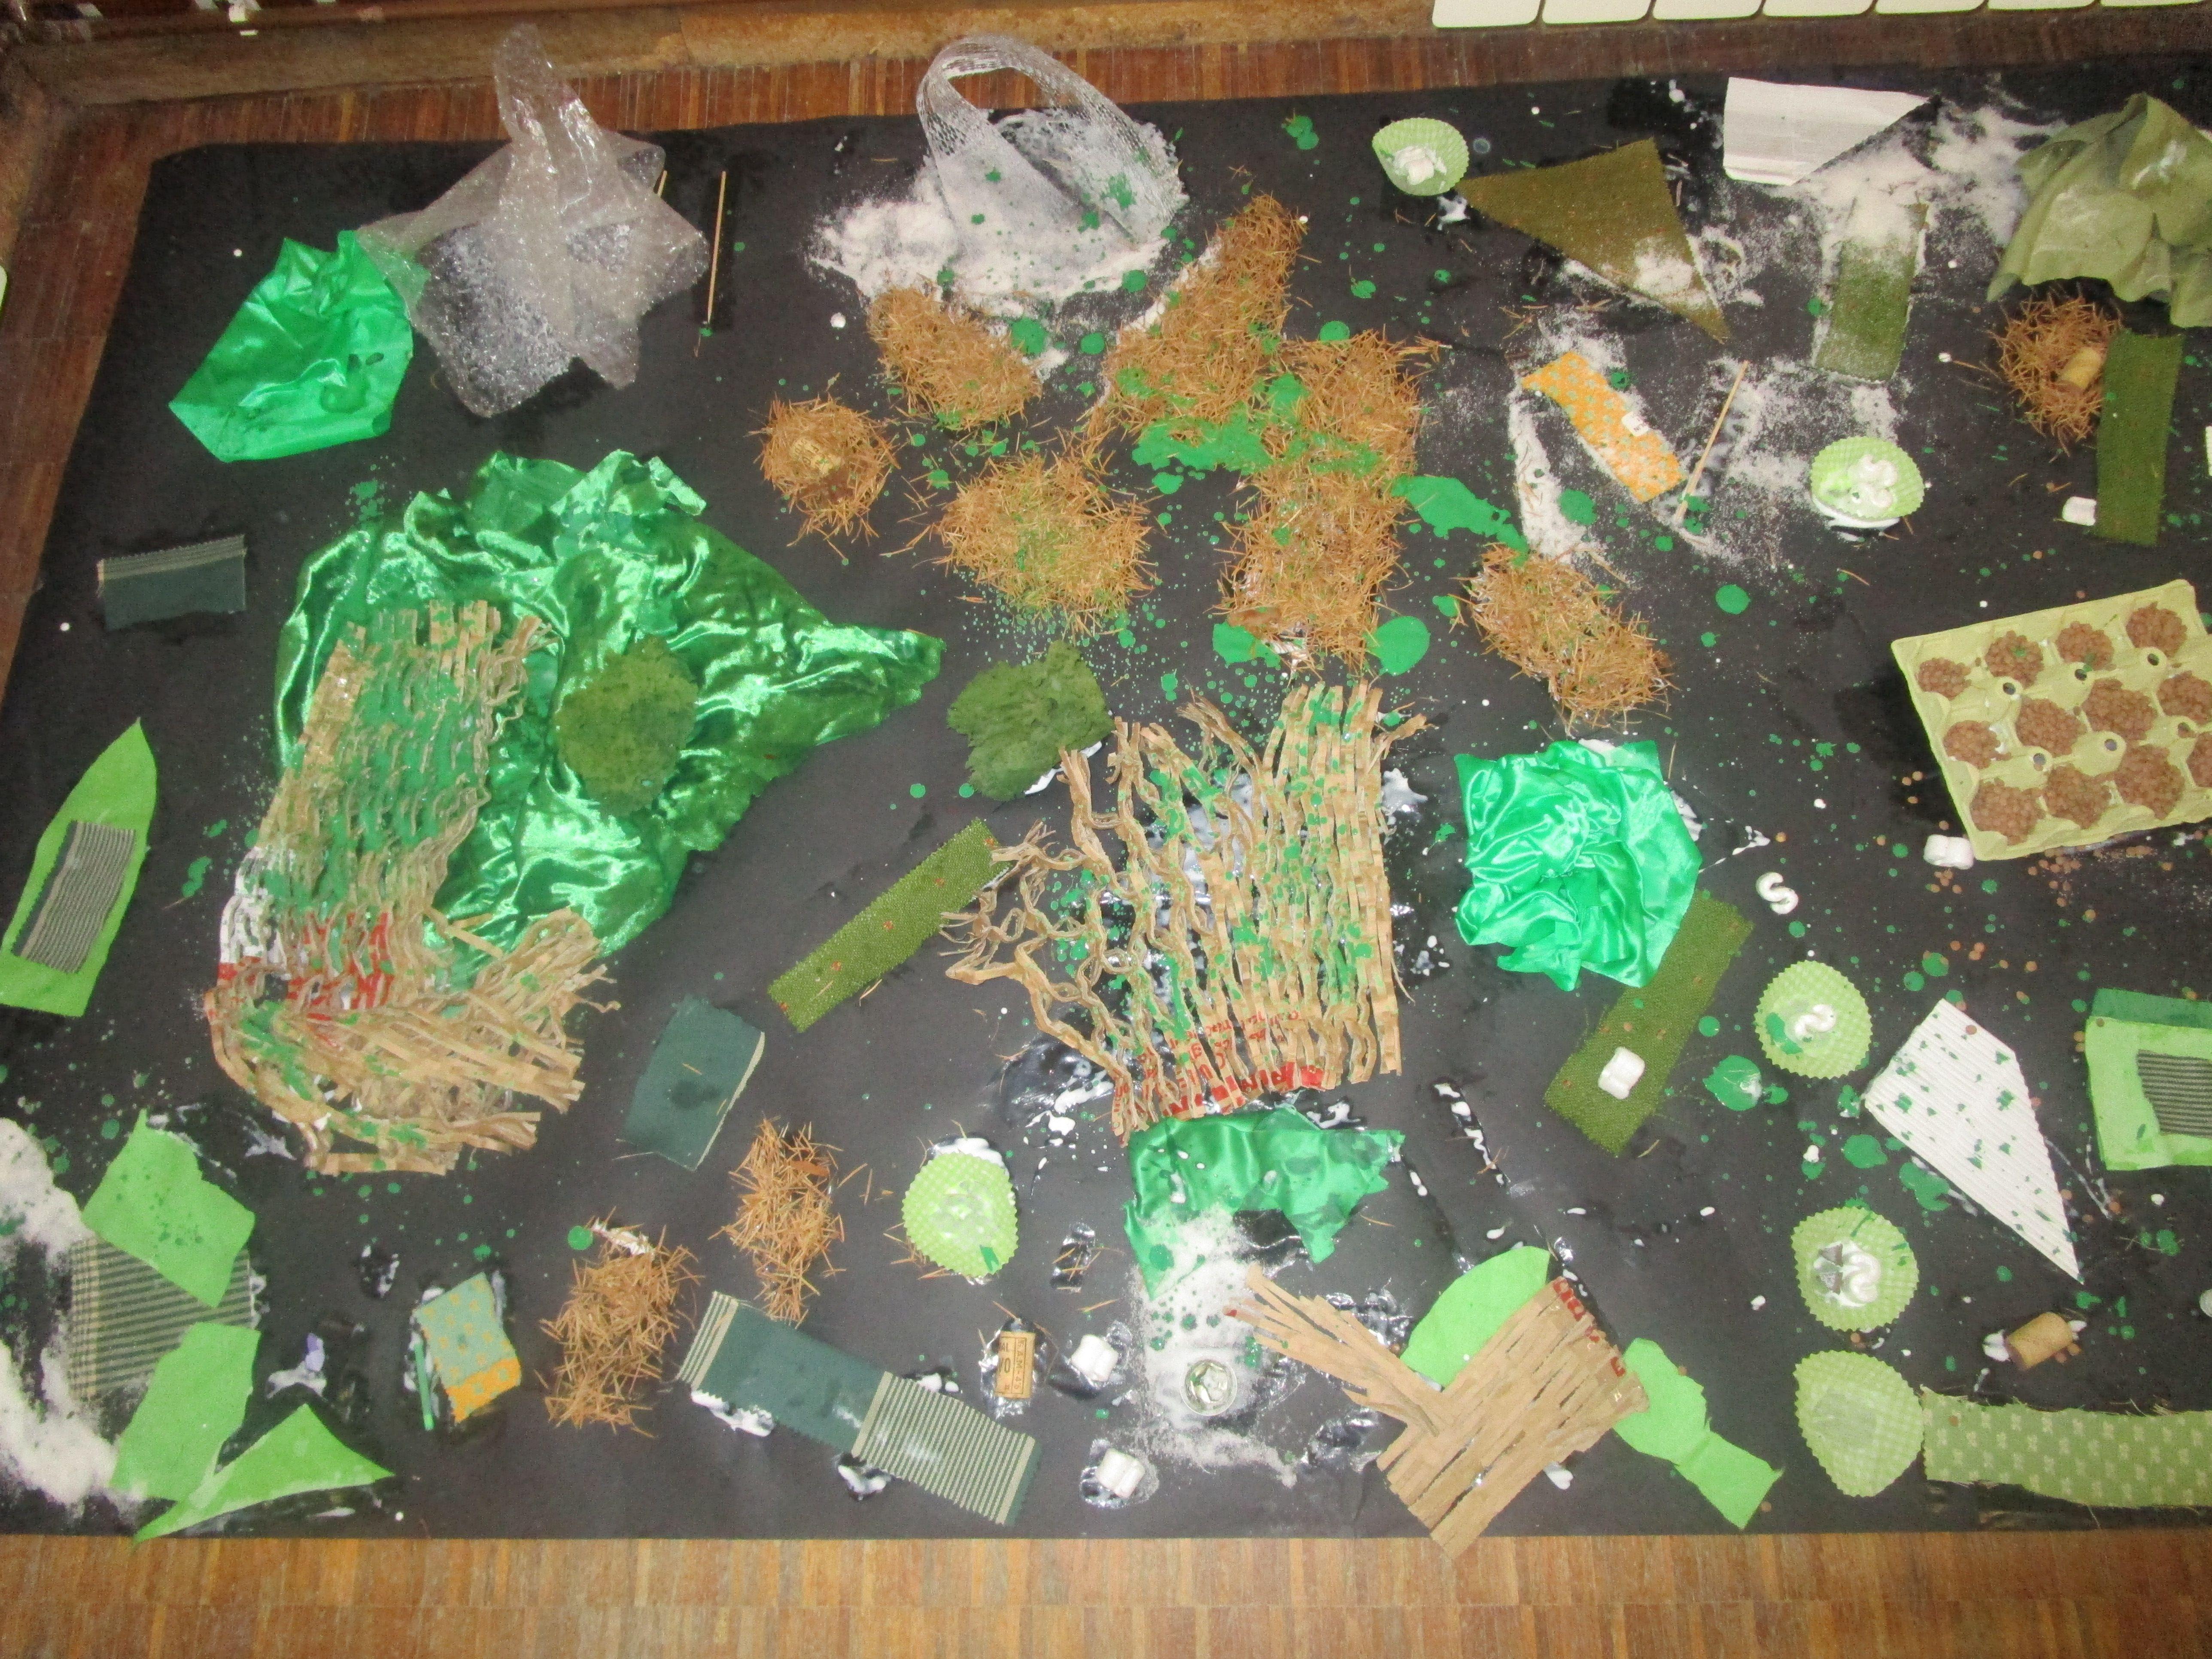 Collage de diferents materials de color verd